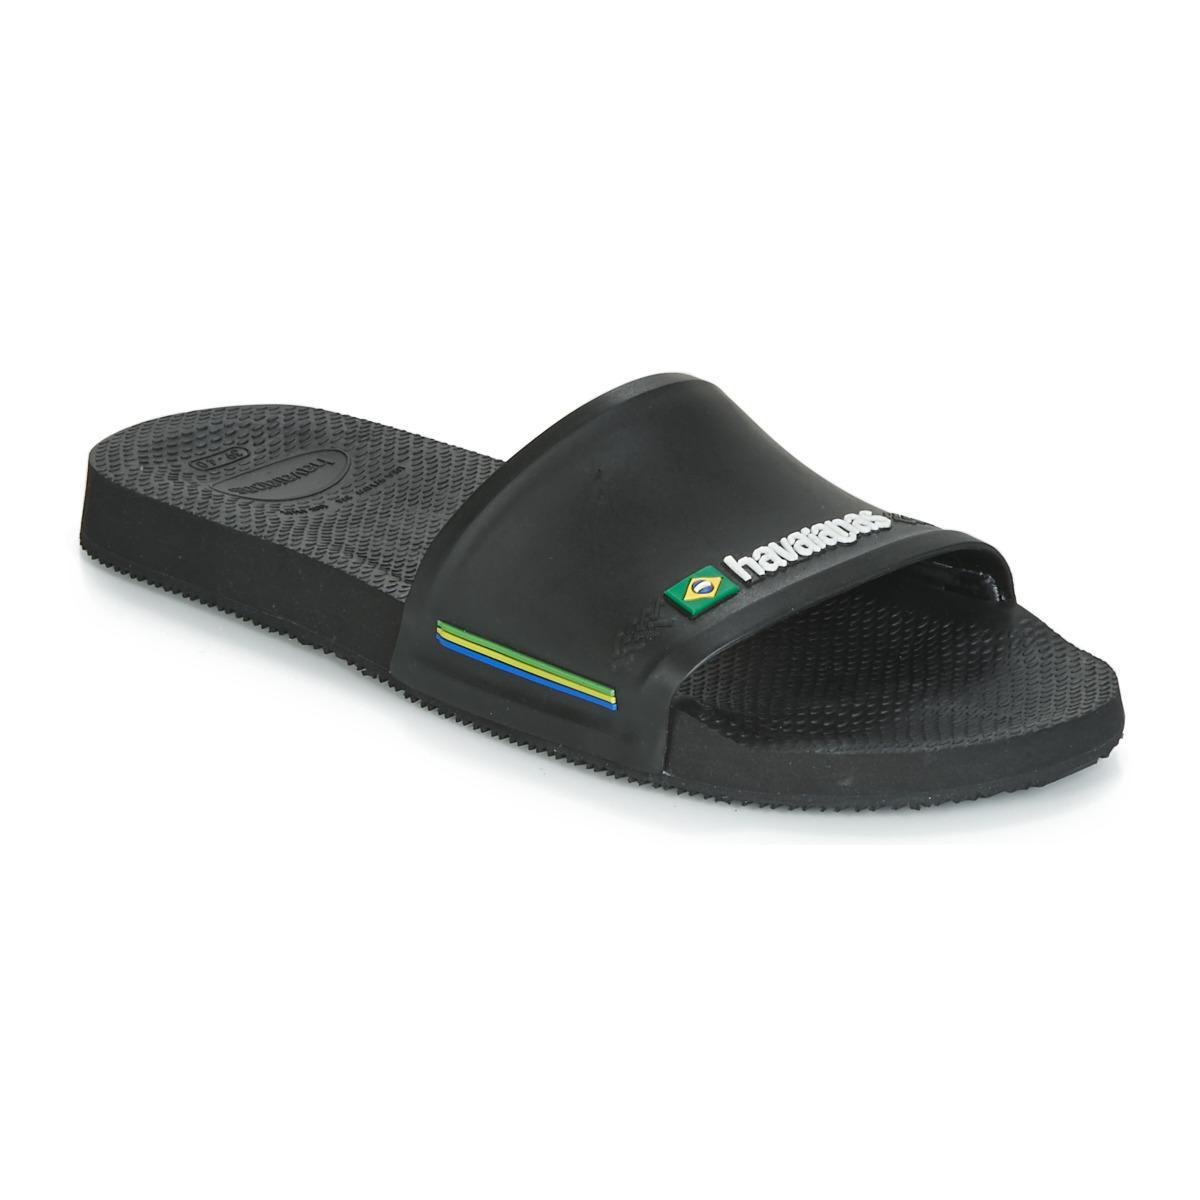 d416e3d7a Havaianas Slides in Black for Men - Save 23% - Lyst